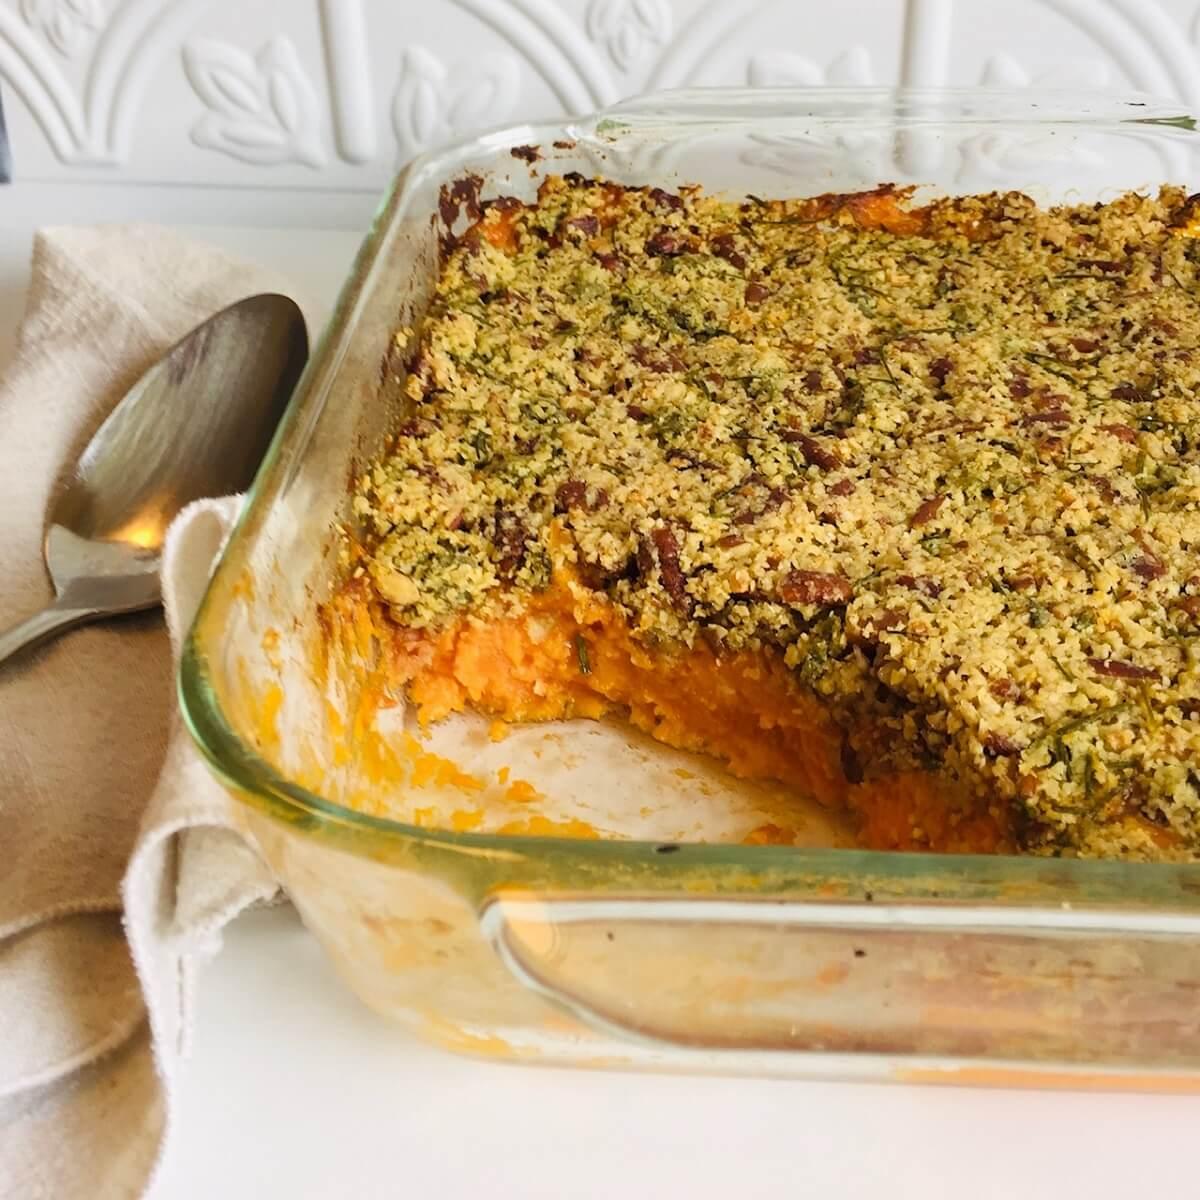 Vegetarian Gluten Free Casserole Recipes